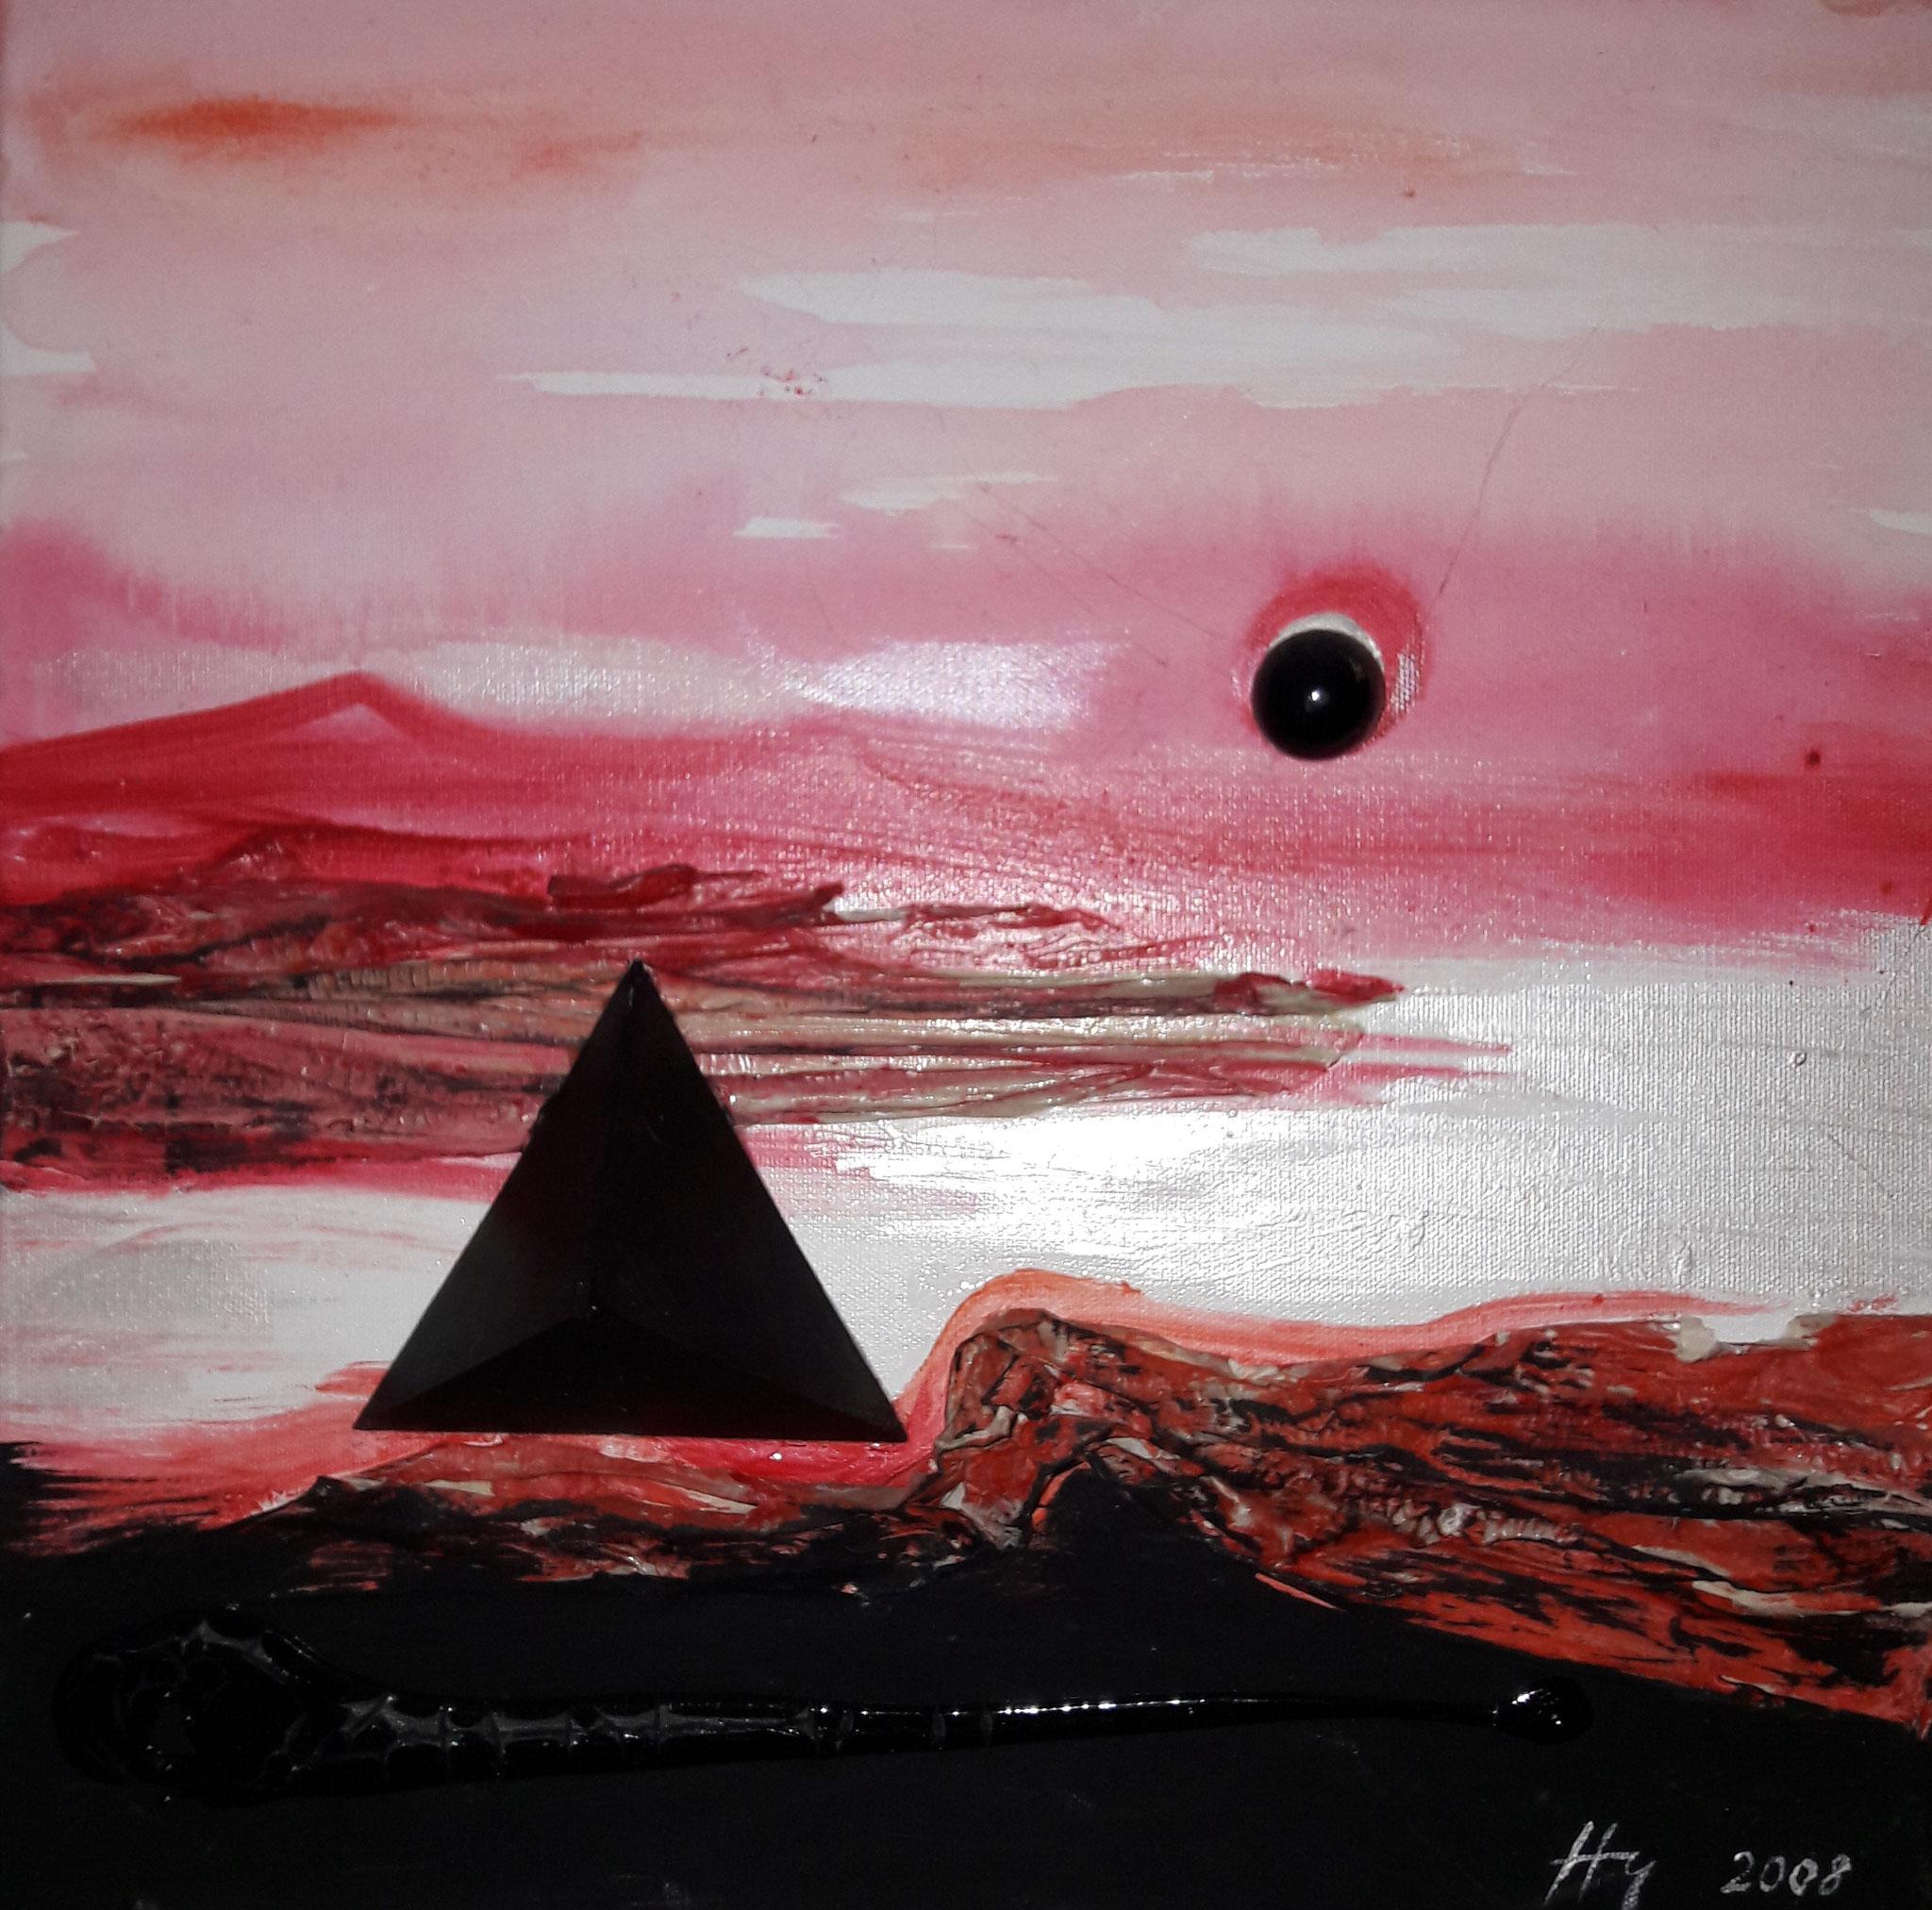 Imagination Japan, Acryl-Relief, 40 x 40cm, 2008